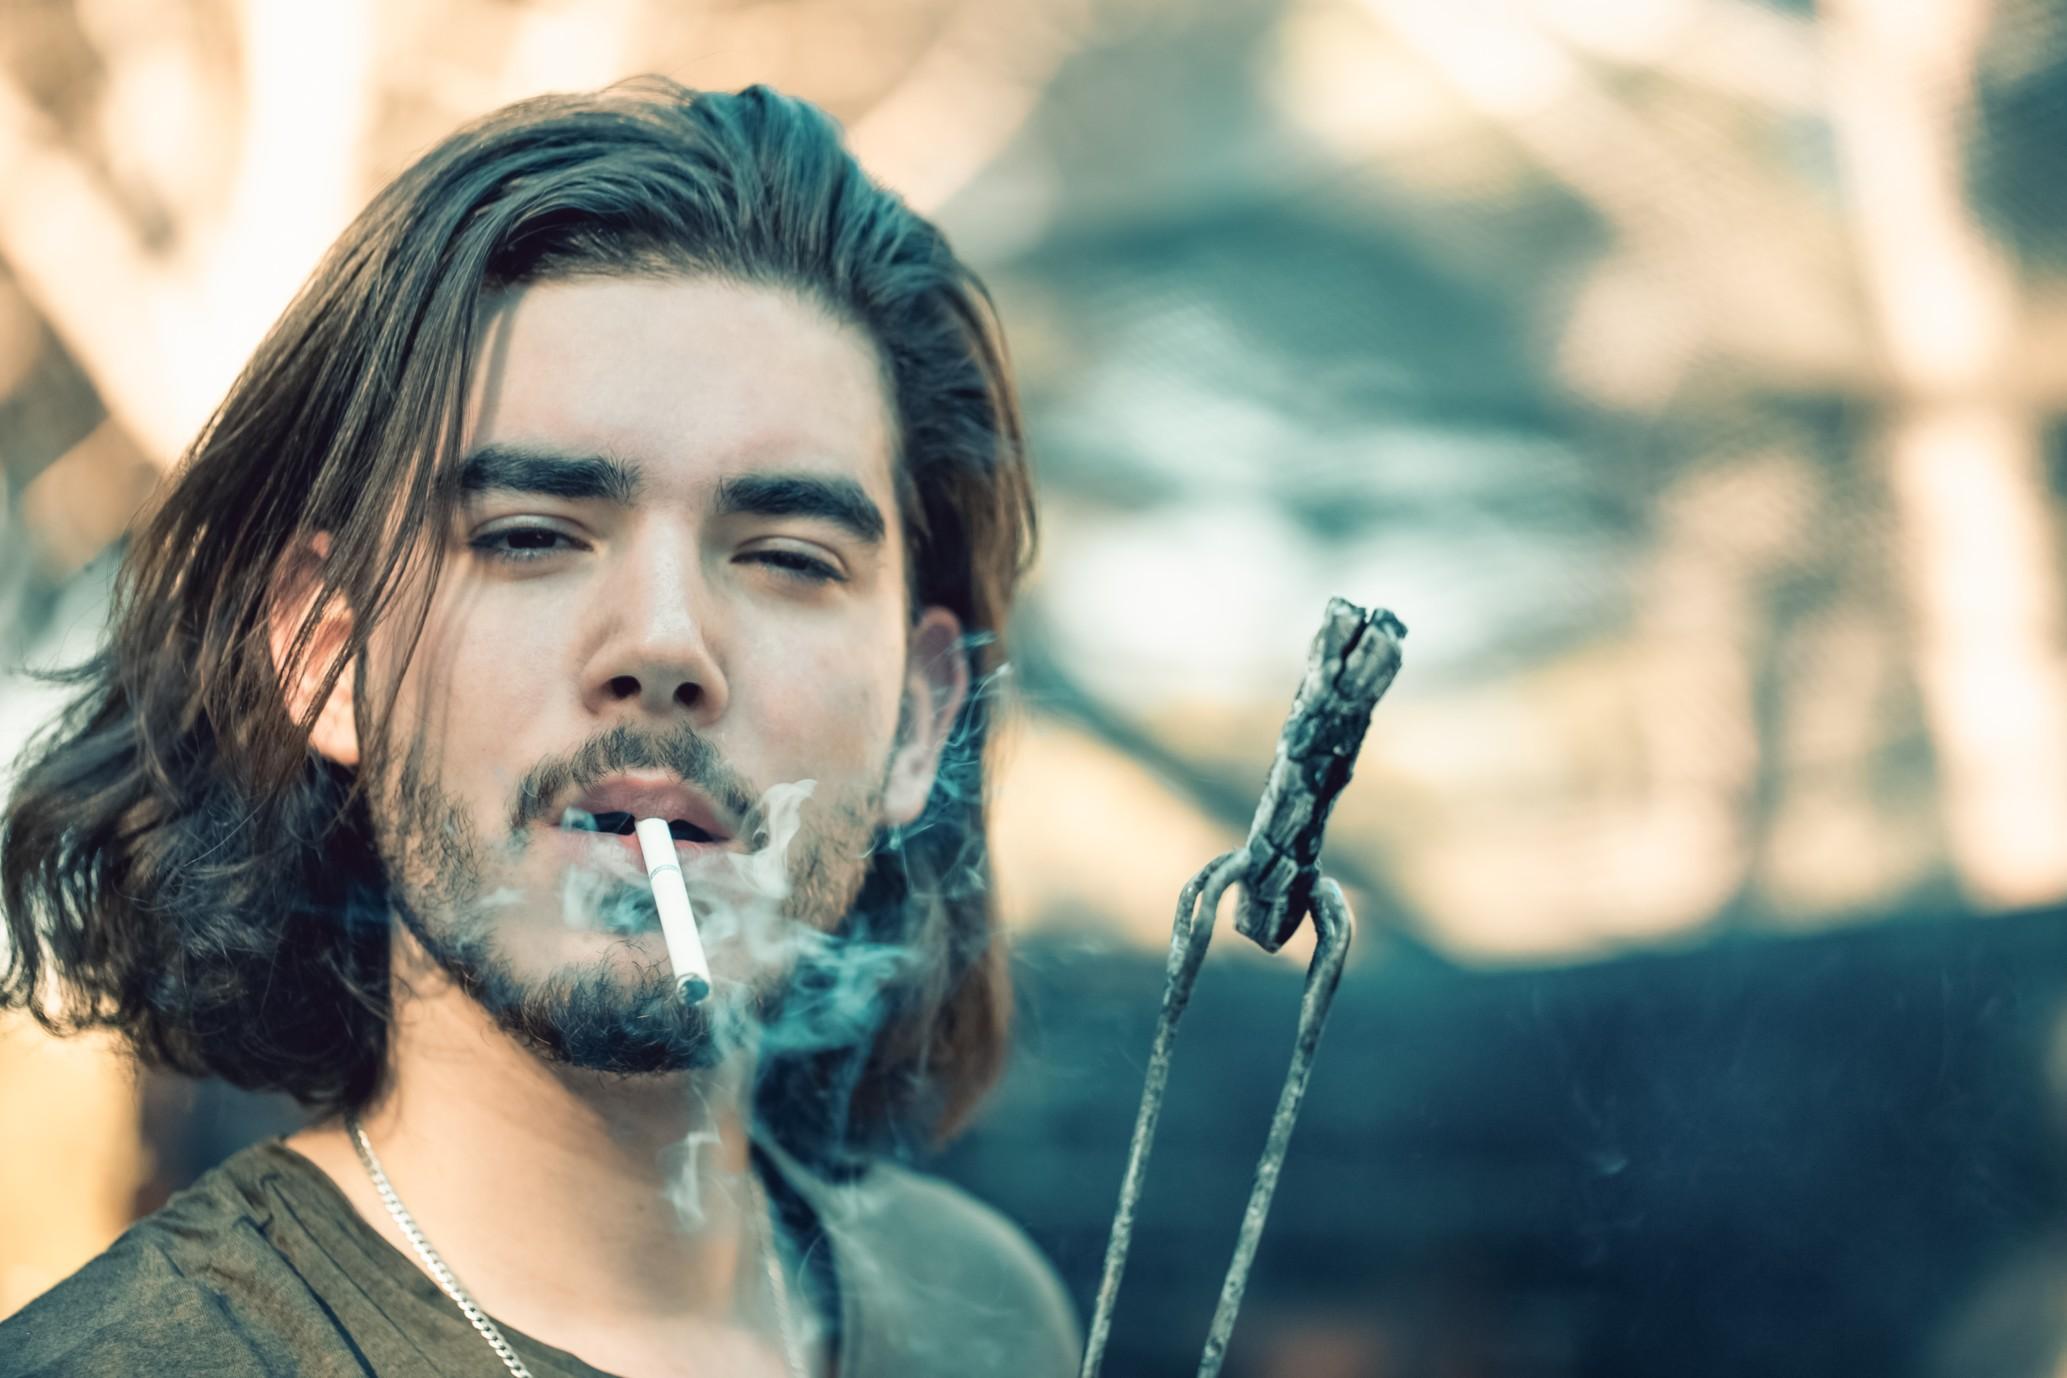 Cigarettes Smoking Room